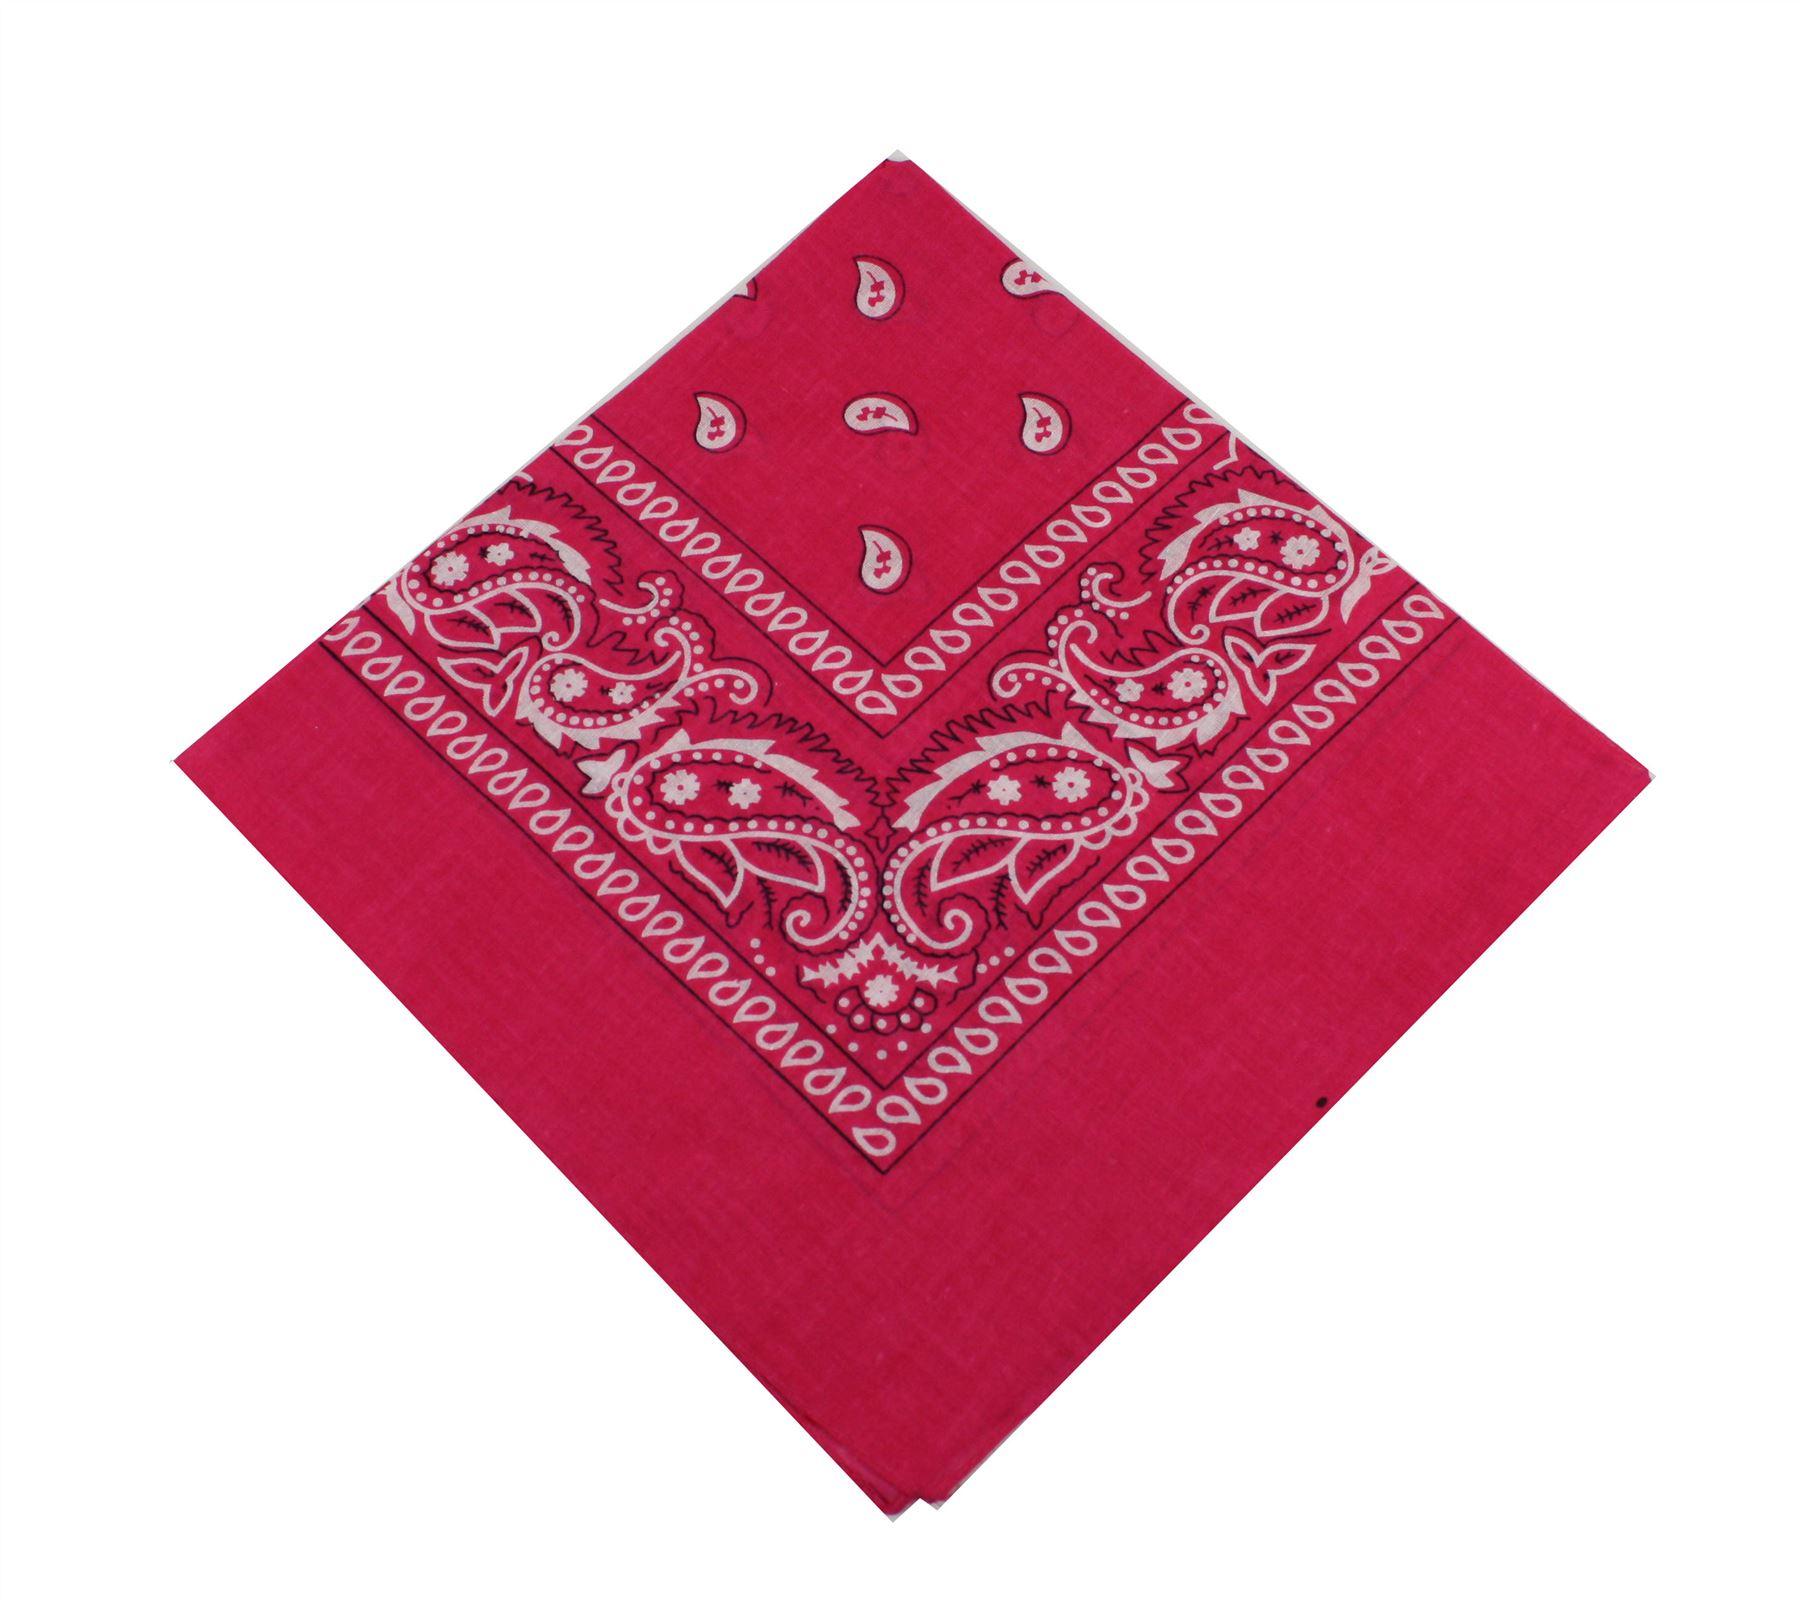 paisley bandana mens ladies headwear cotton scarf neck wrist wrap headtie hair b ebay. Black Bedroom Furniture Sets. Home Design Ideas